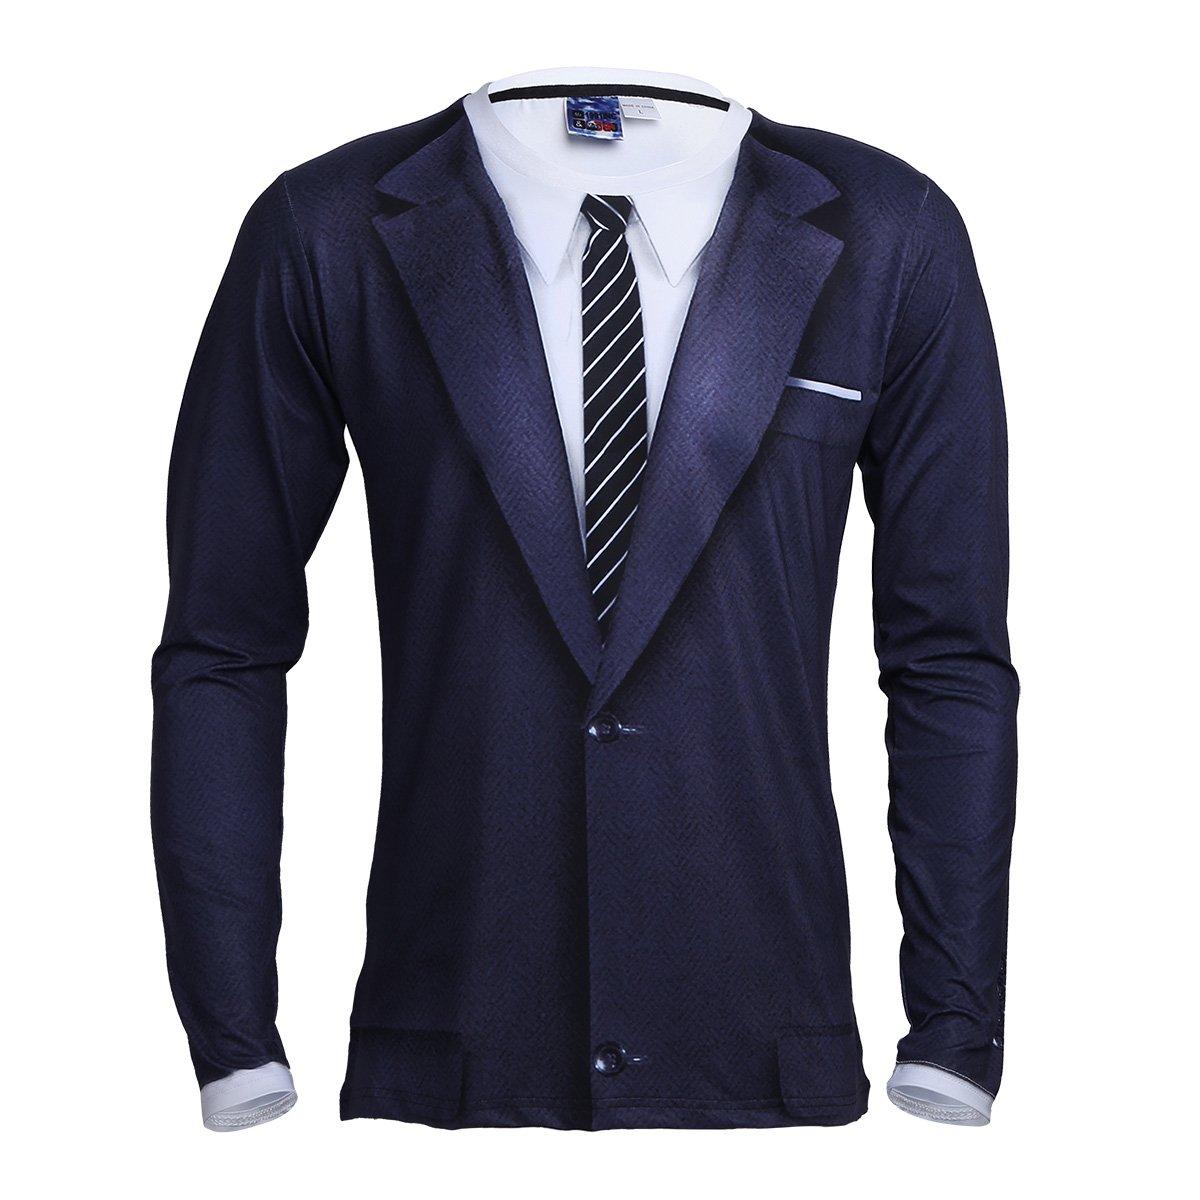 CHICTRY Men's Novelty 3D Printed Tie Tuxedo Long Sleeve T-Shirt Tops White Large